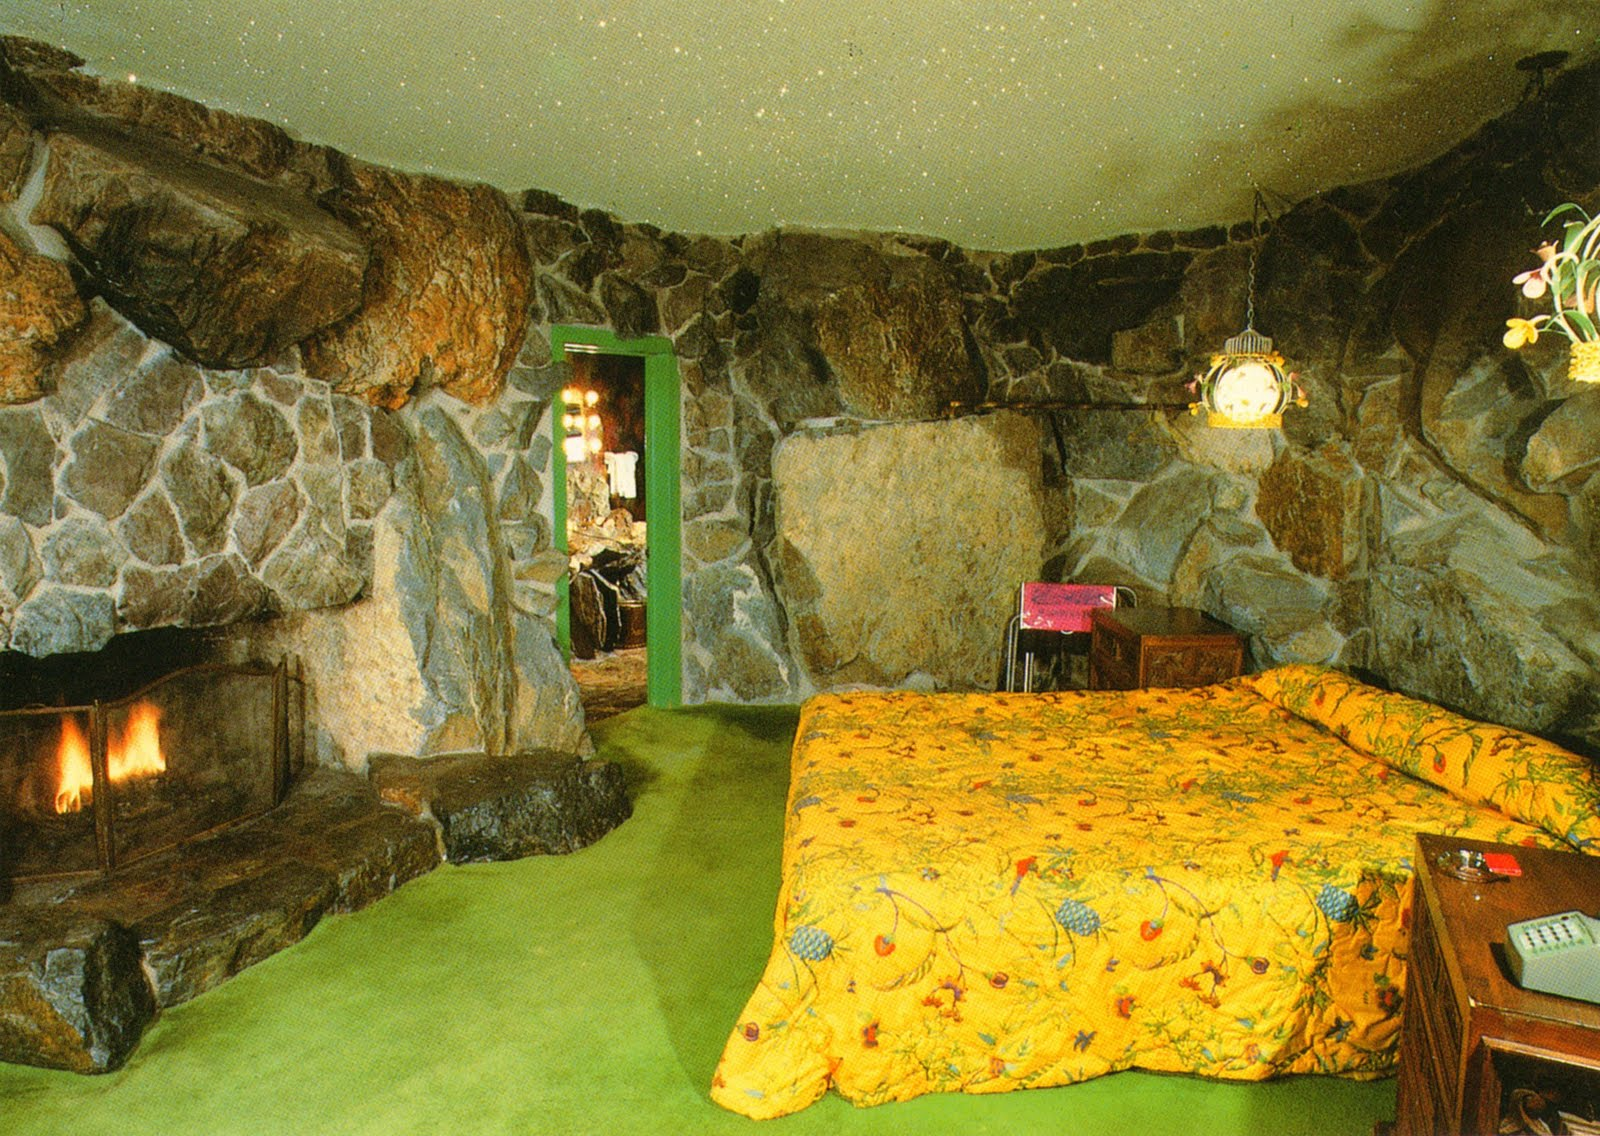 Neat Stuff Blog: The Madonna Inn